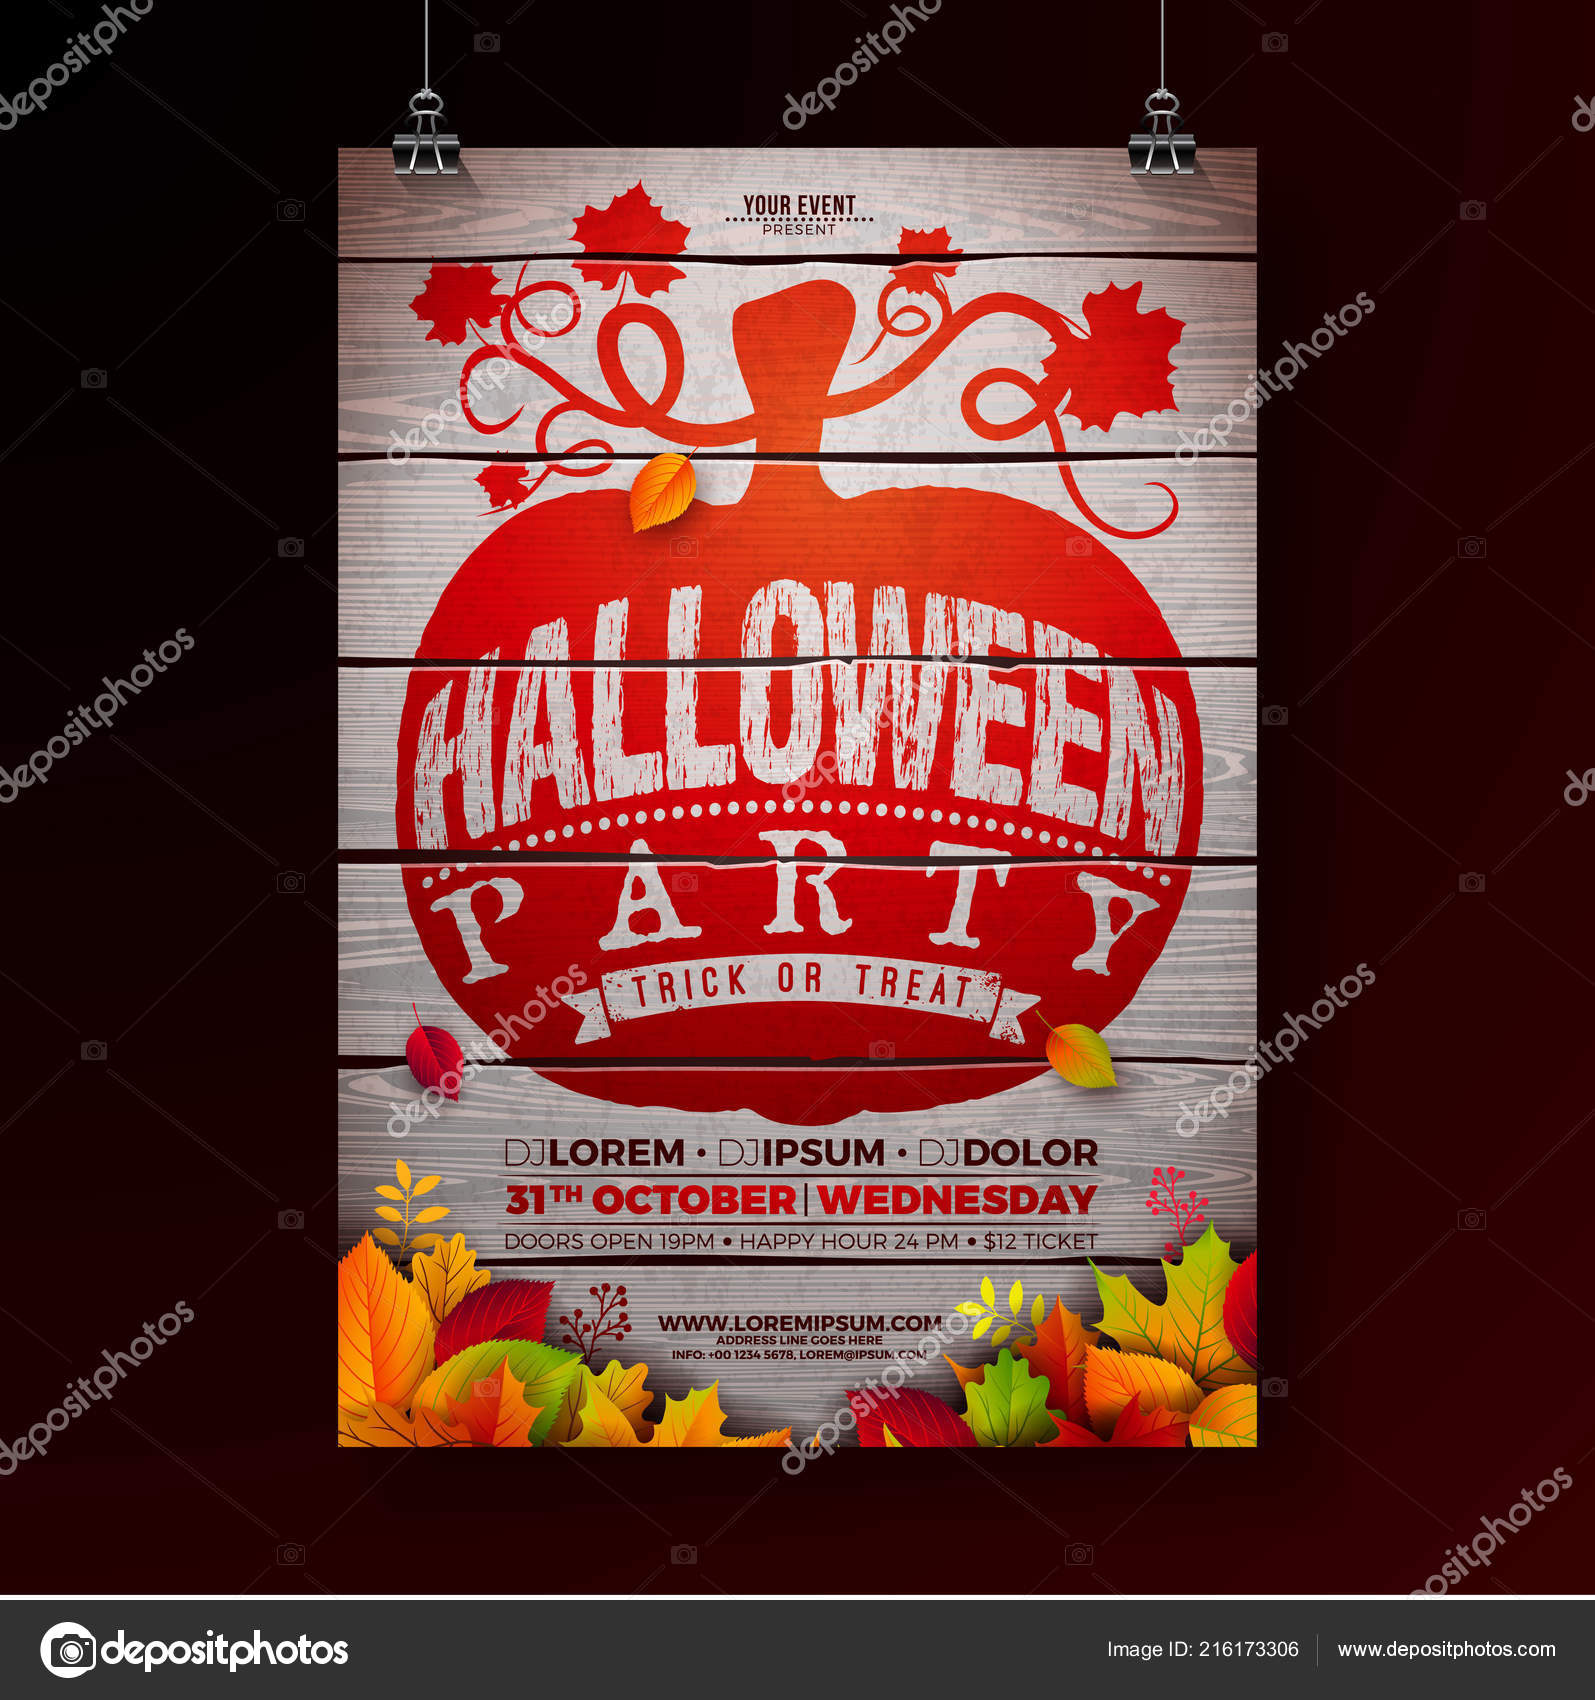 Halloween Party Design - theminecraftserver.com - Best Resume Templates